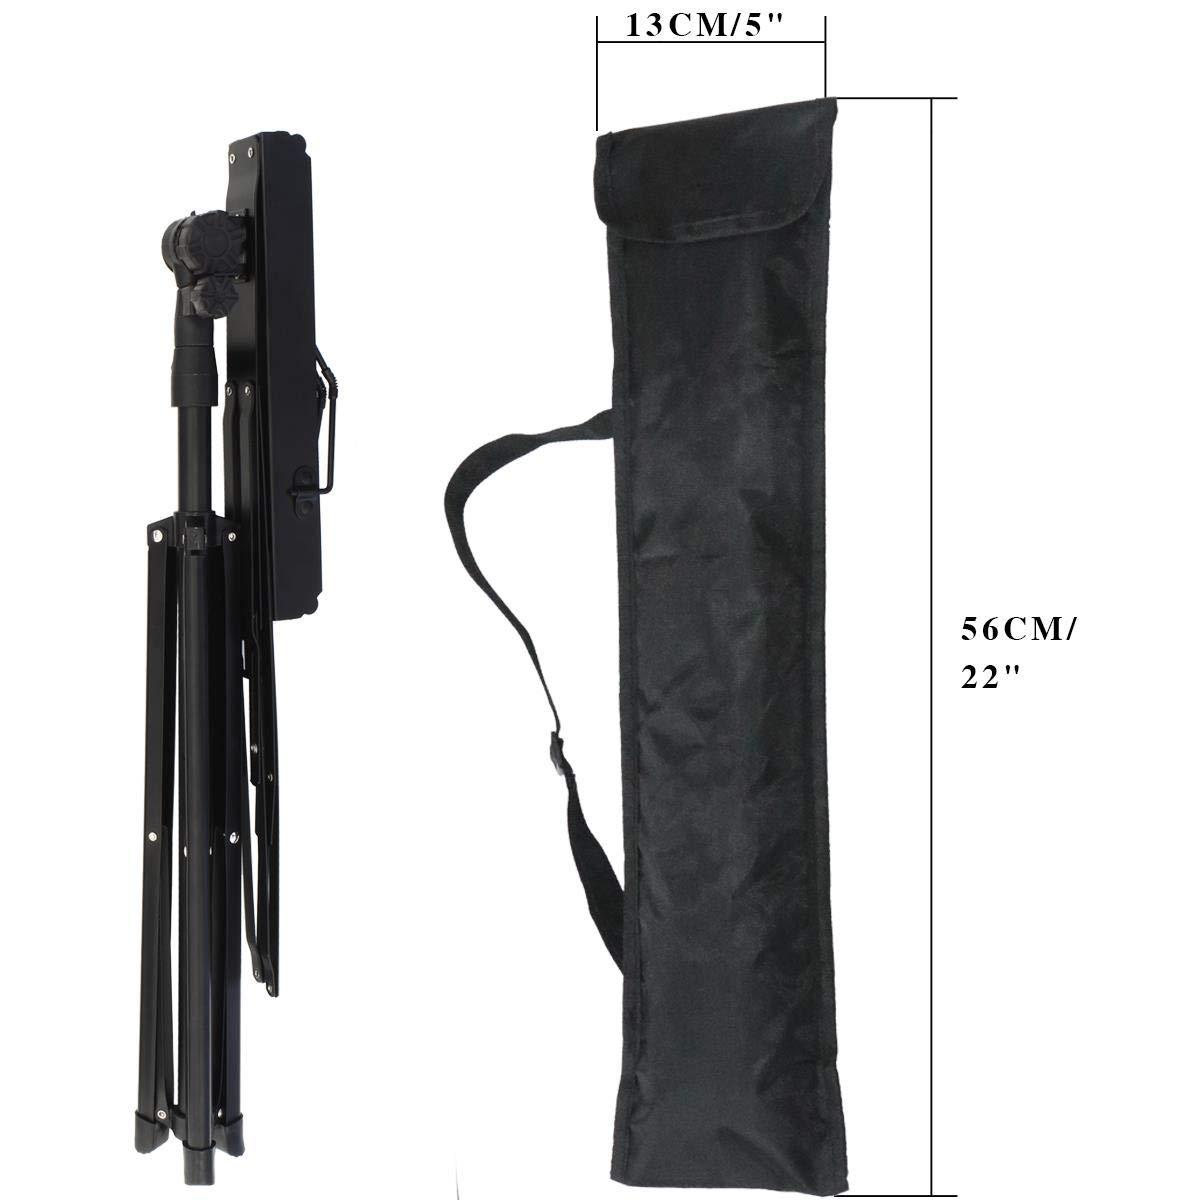 iGadgitz Xtra U6984 Metal Portable Sheet Music Stand Folding Music Holder with Carry Bag Black